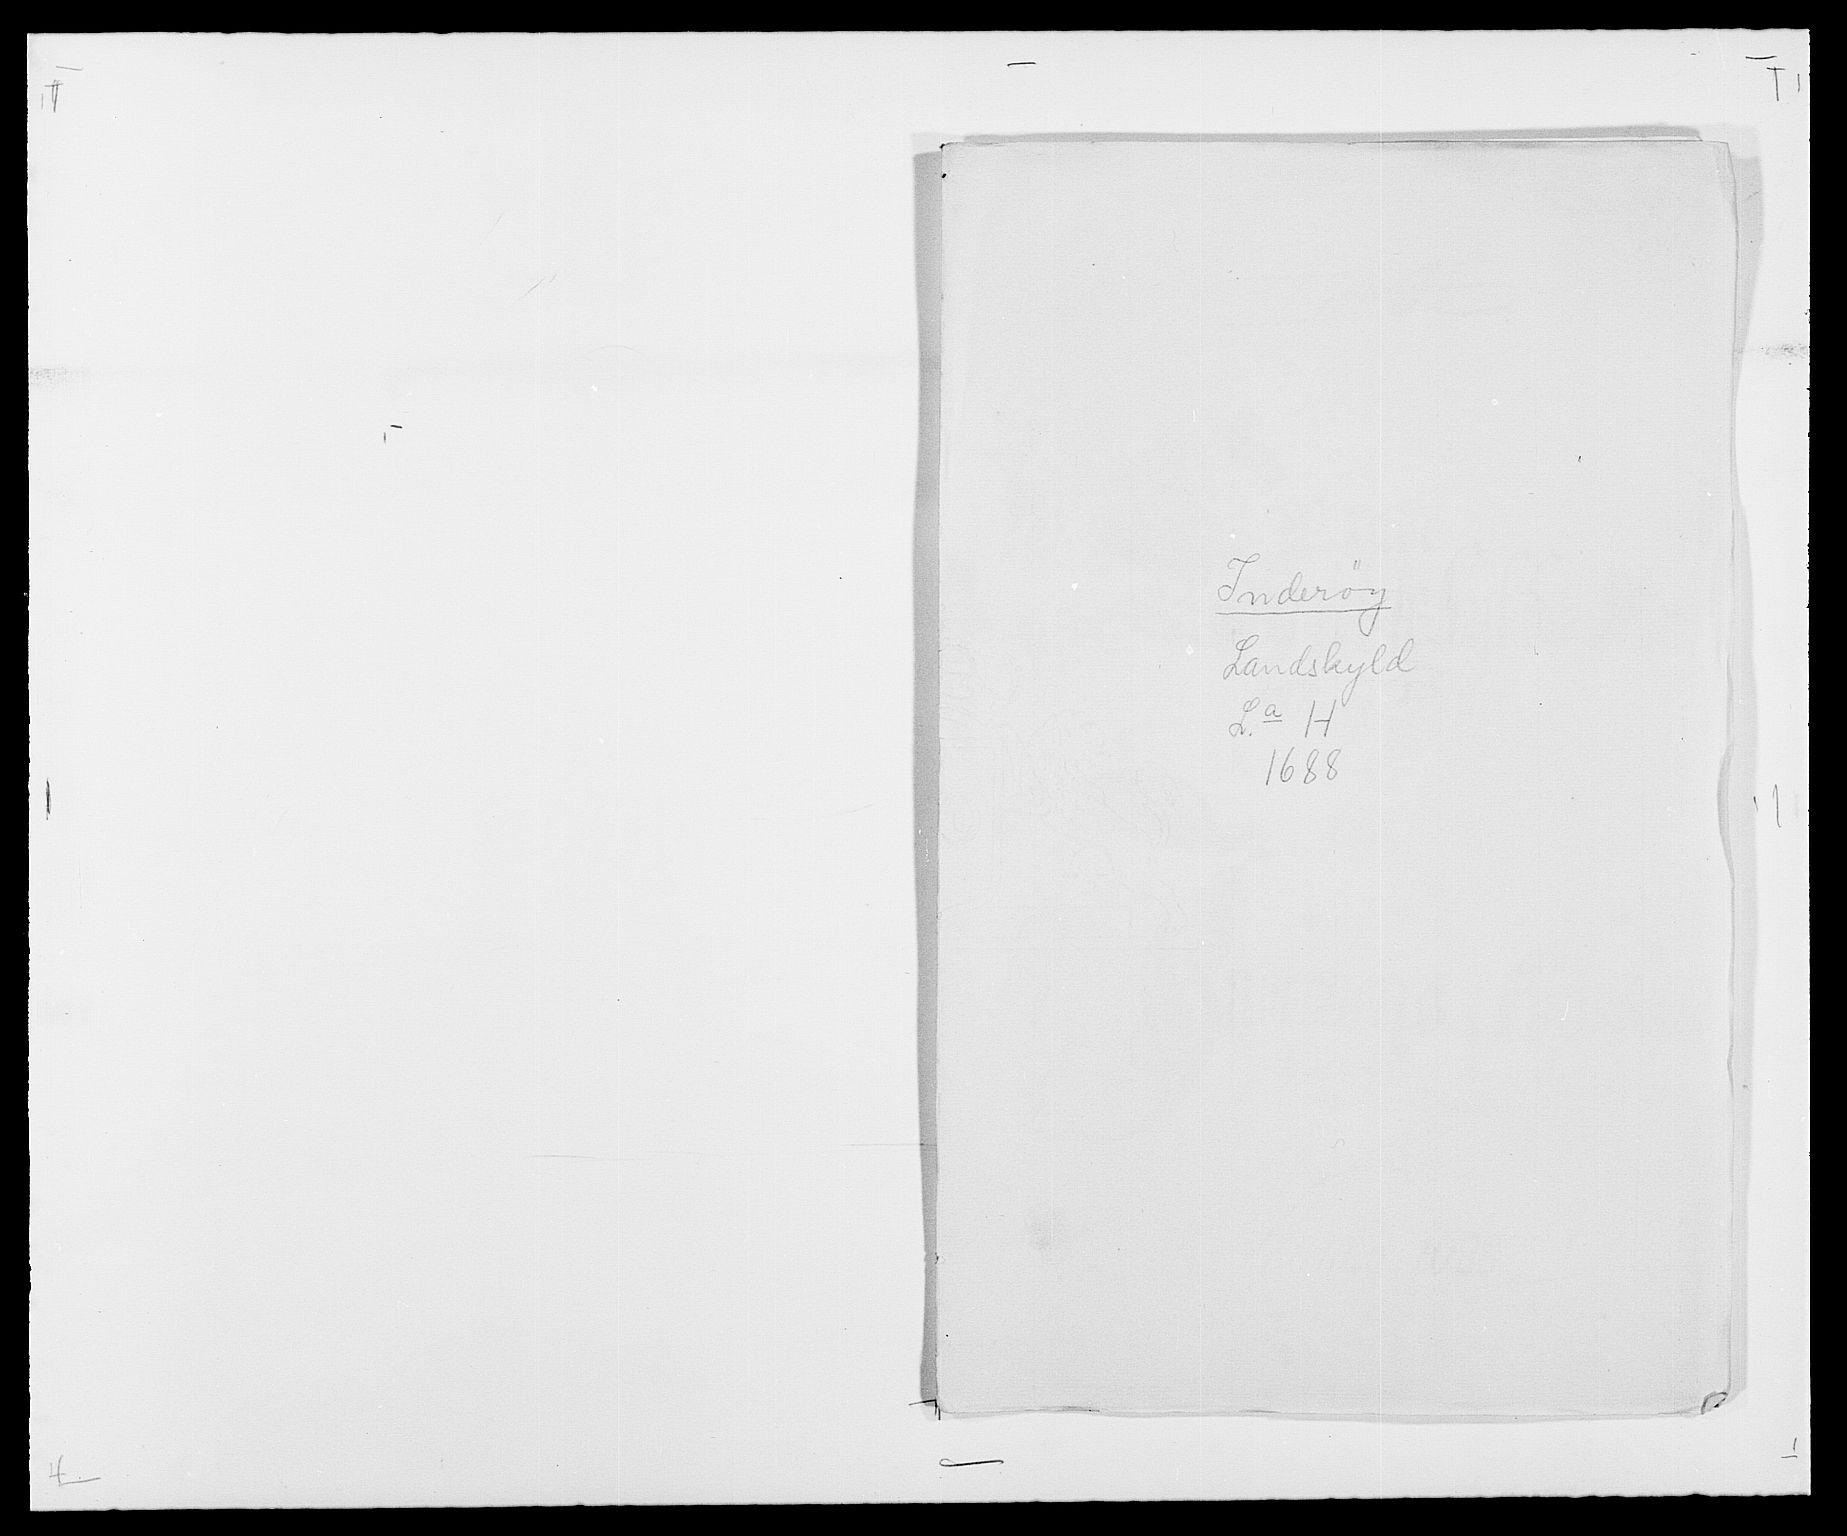 RA, Rentekammeret inntil 1814, Reviderte regnskaper, Fogderegnskap, R63/L4306: Fogderegnskap Inderøy, 1687-1689, s. 295